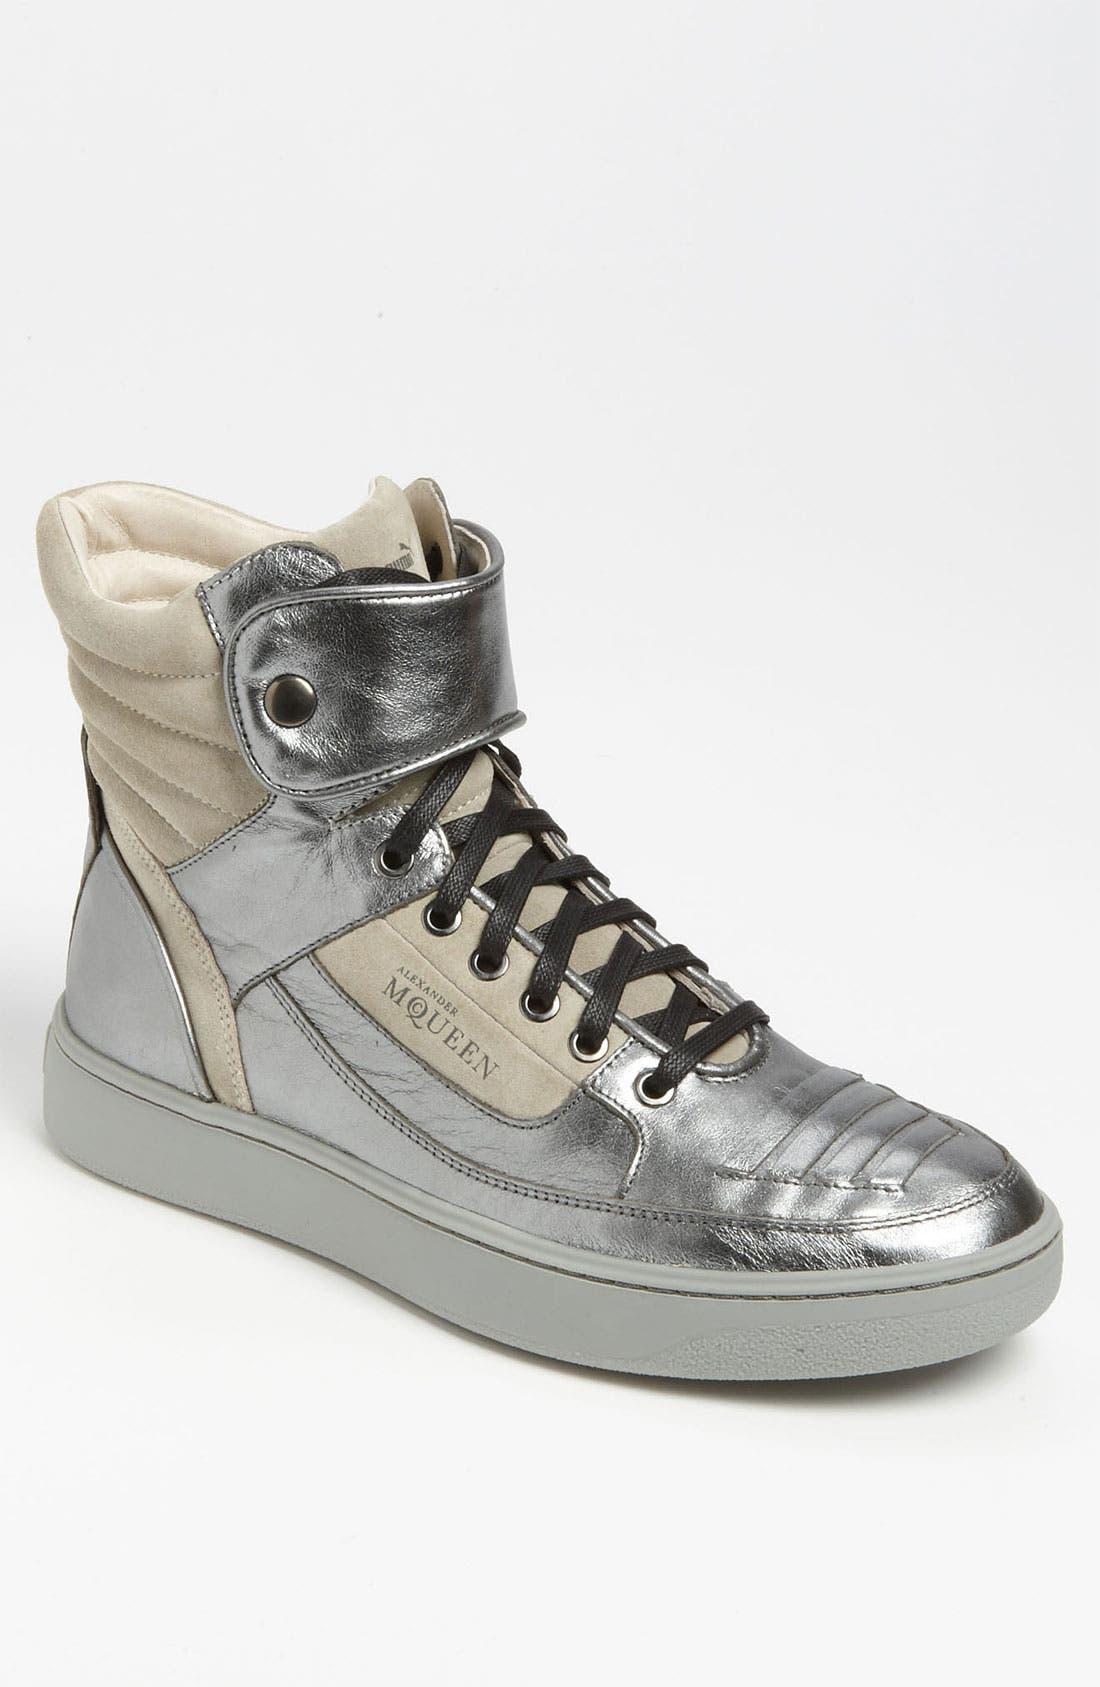 Main Image - Alexander McQueen PUMA 'Joust' Sneaker